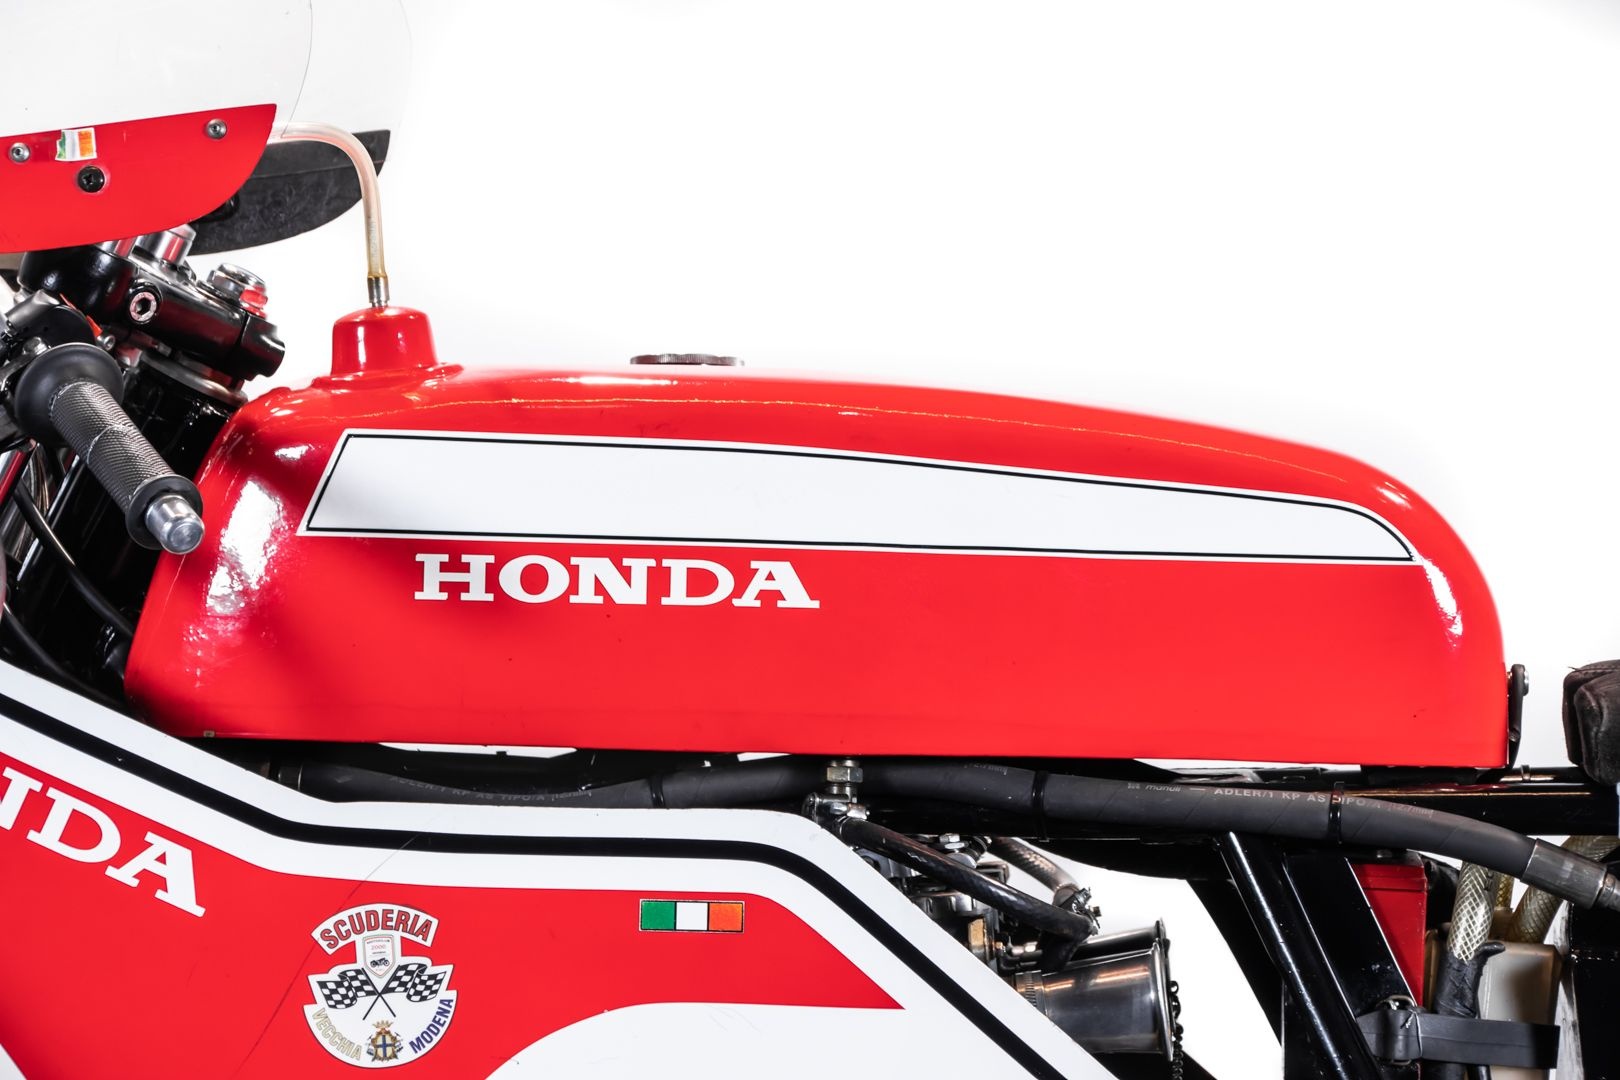 1973 Honda 750 Daytona Replica 72307